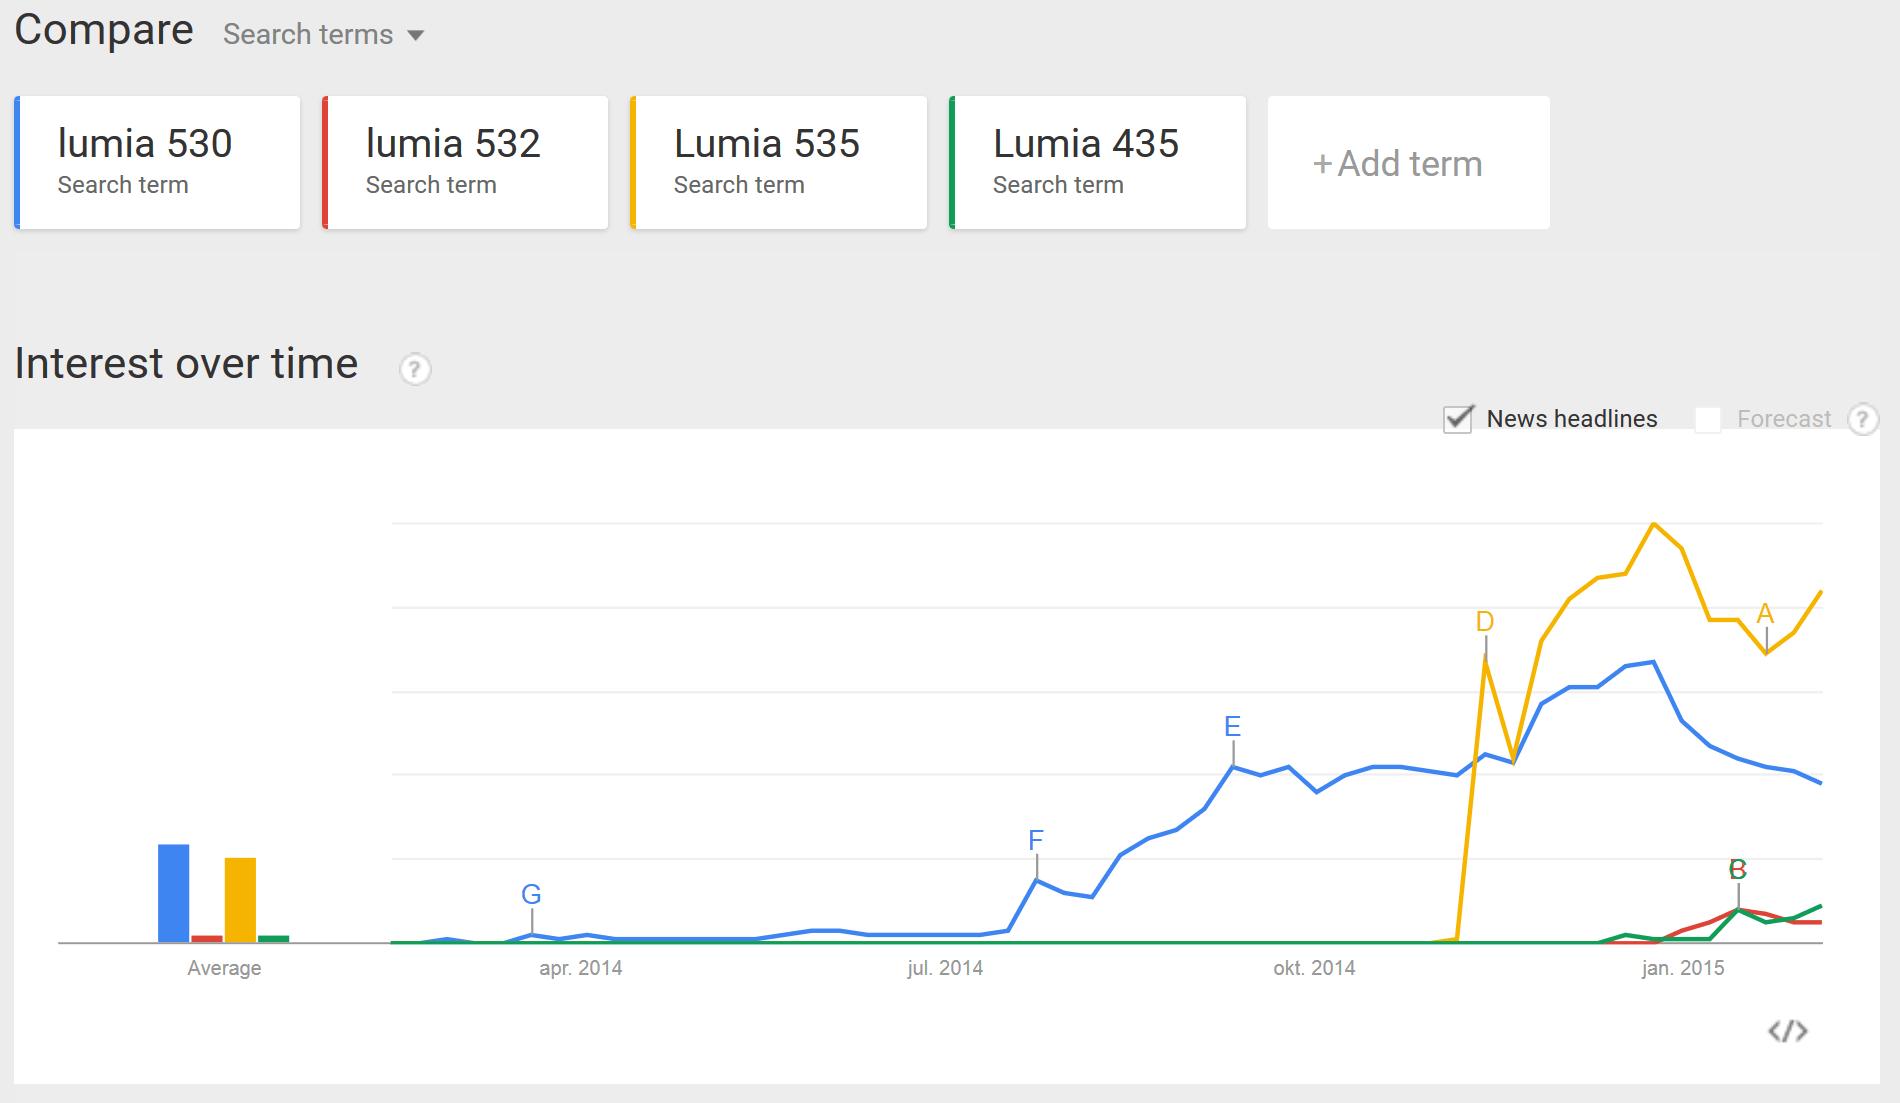 GoogleTrends-Lumia535